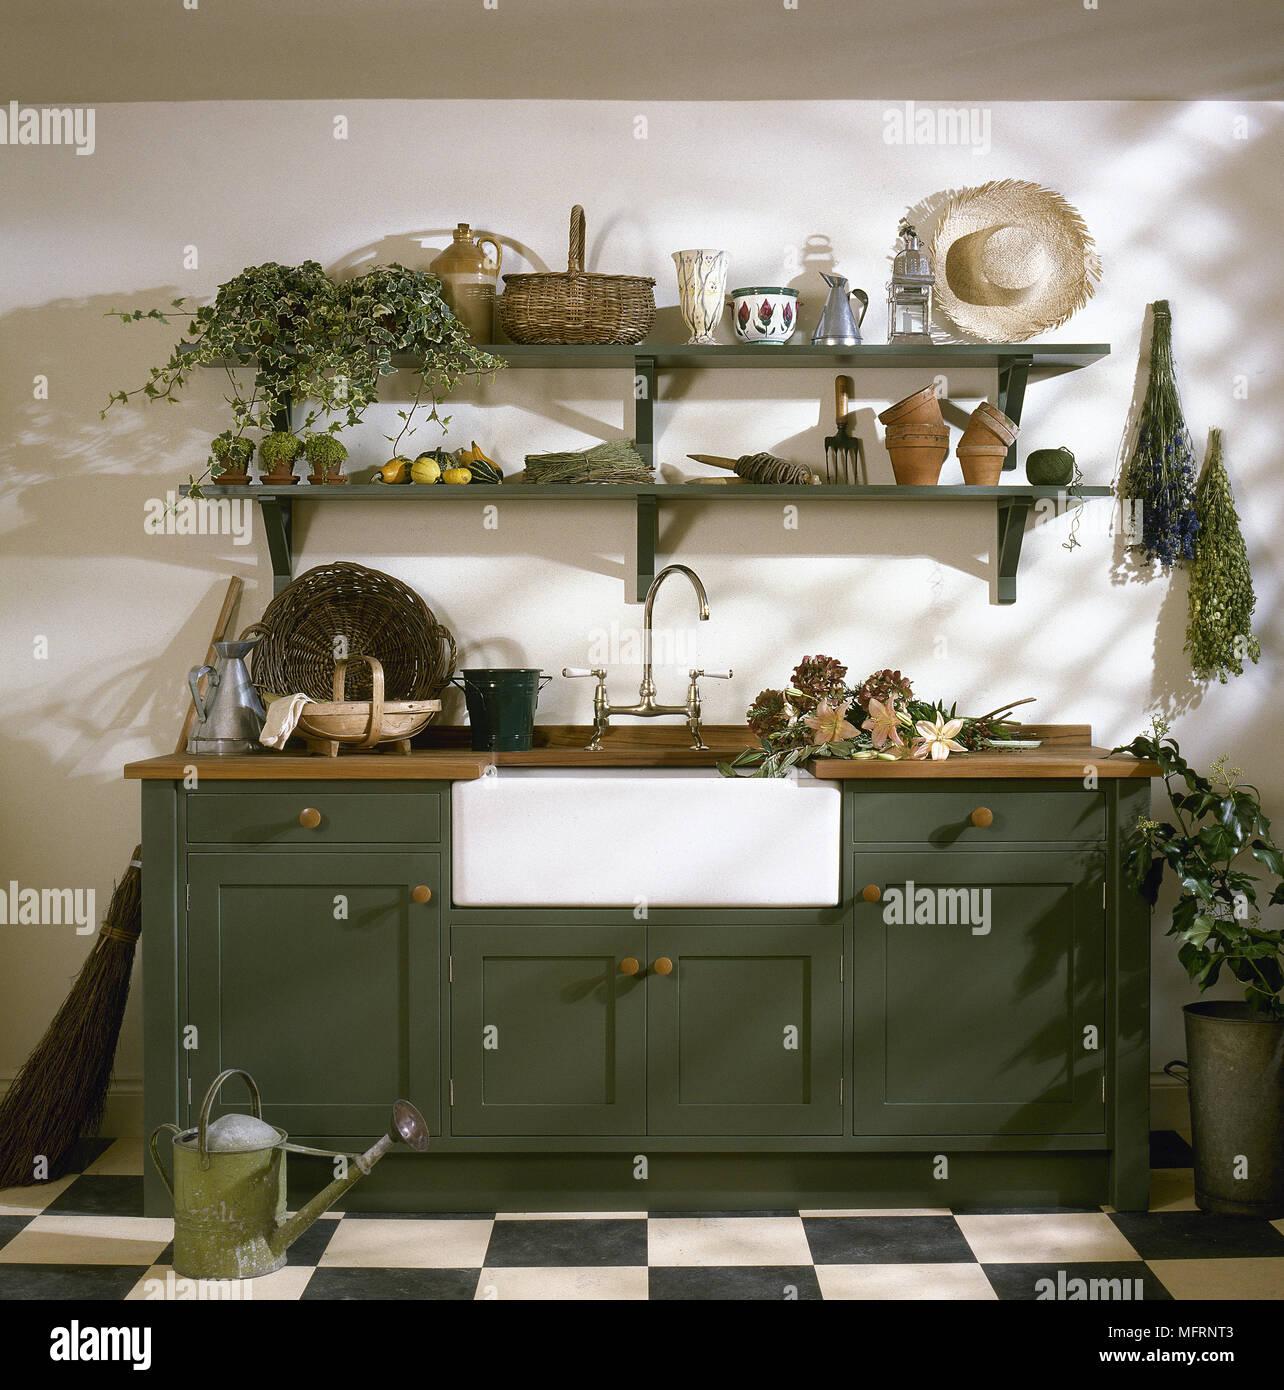 Hermosa 1950 S Cocina Gabinetes Cambio De Imagen Inspiración - Ideas ...